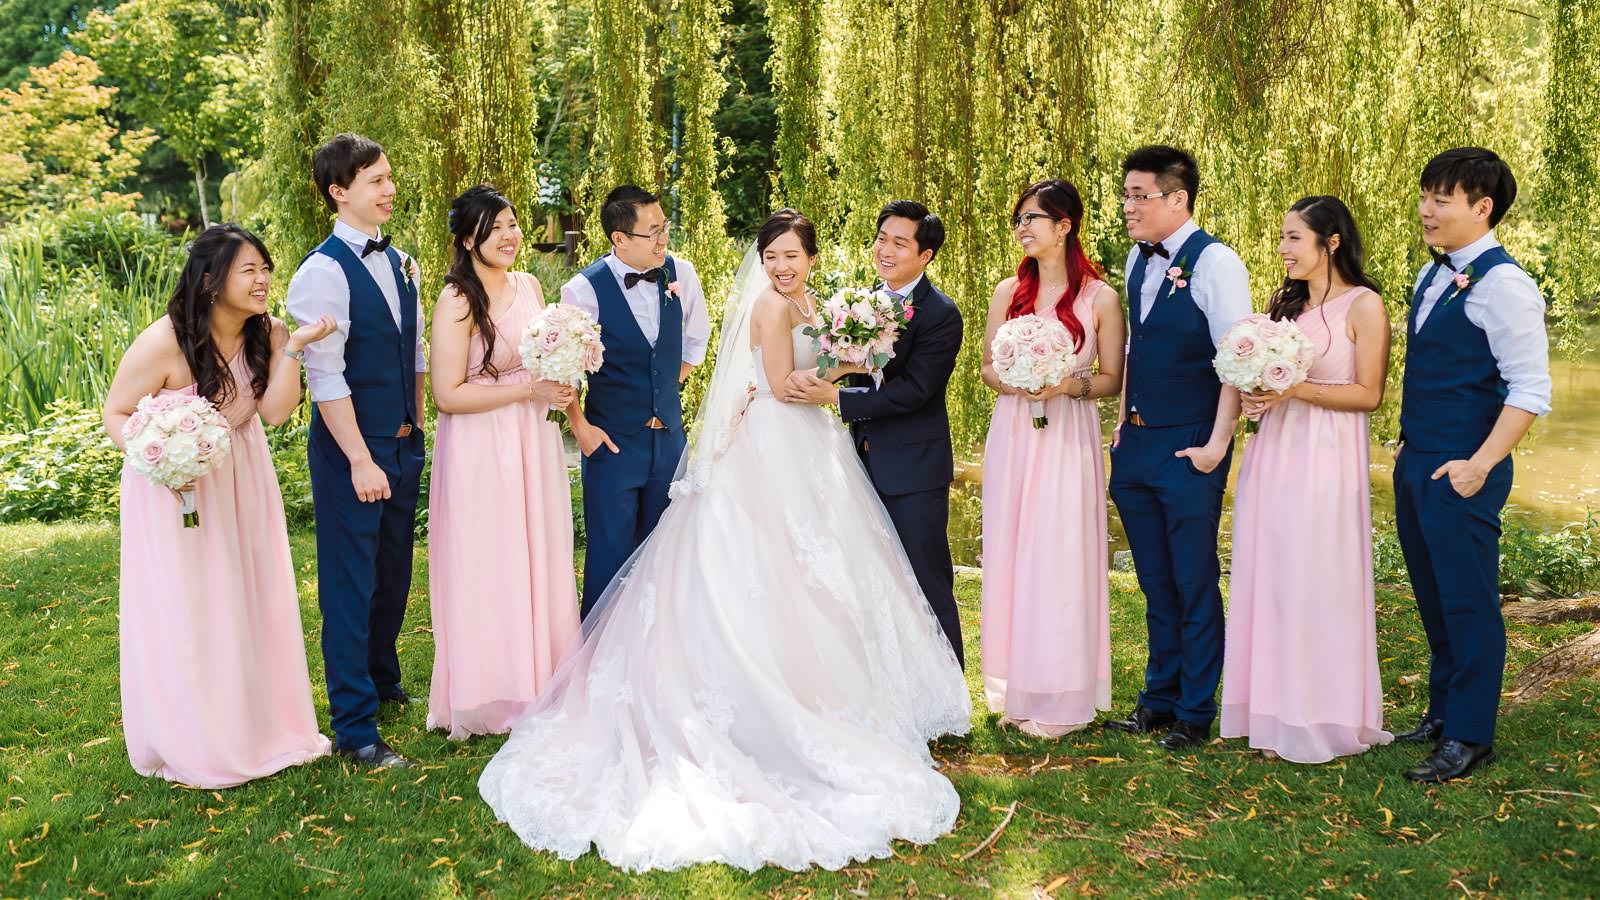 Minoru wedding party.jpg